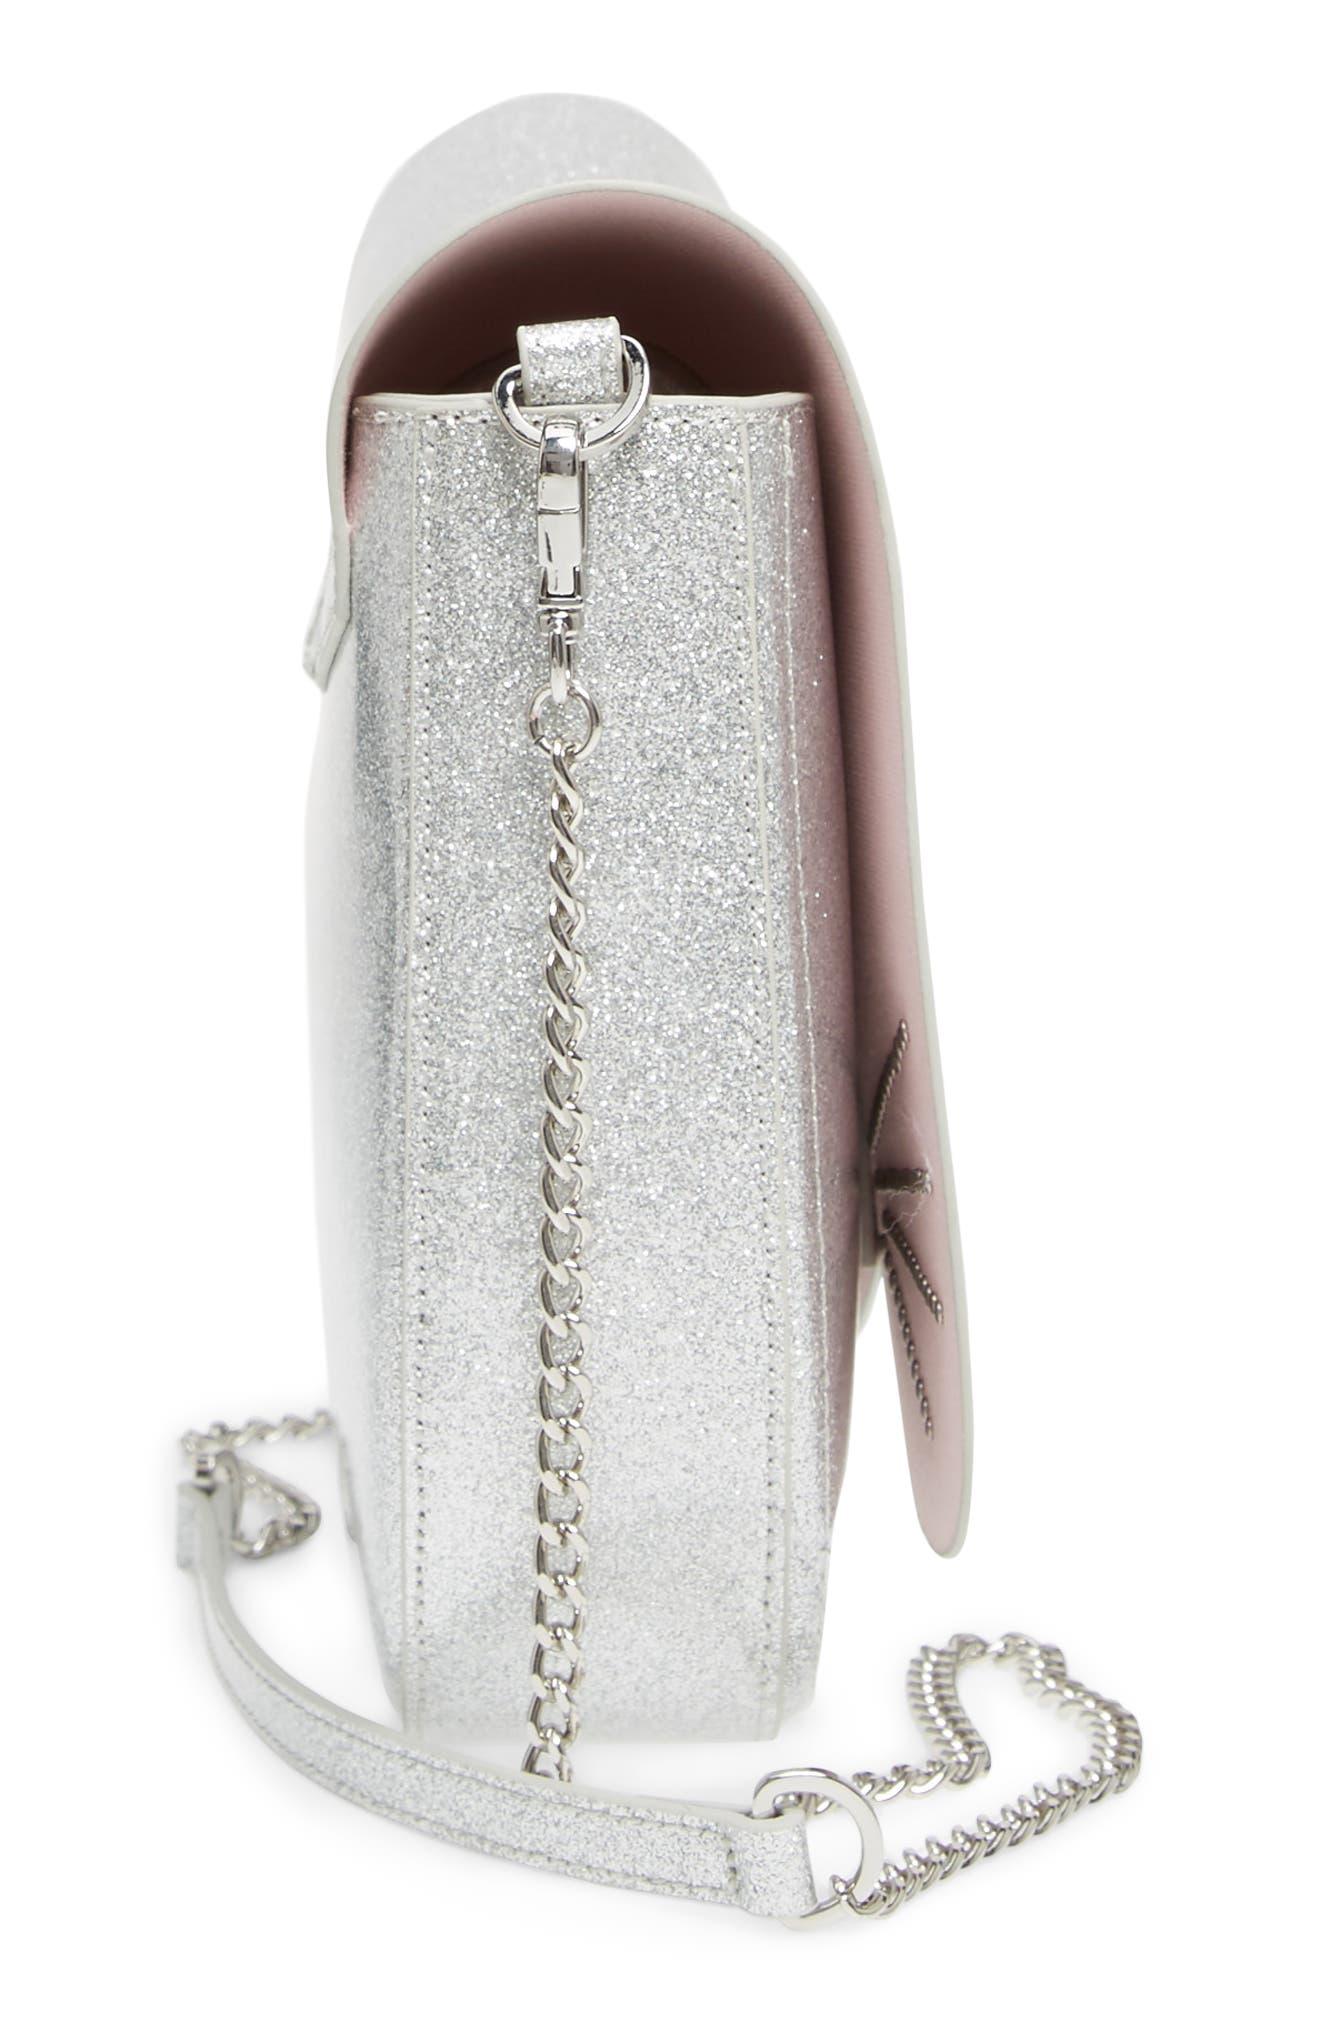 Hildaa Glitter Faux Leather Crossbody Bag,                             Alternate thumbnail 5, color,                             040